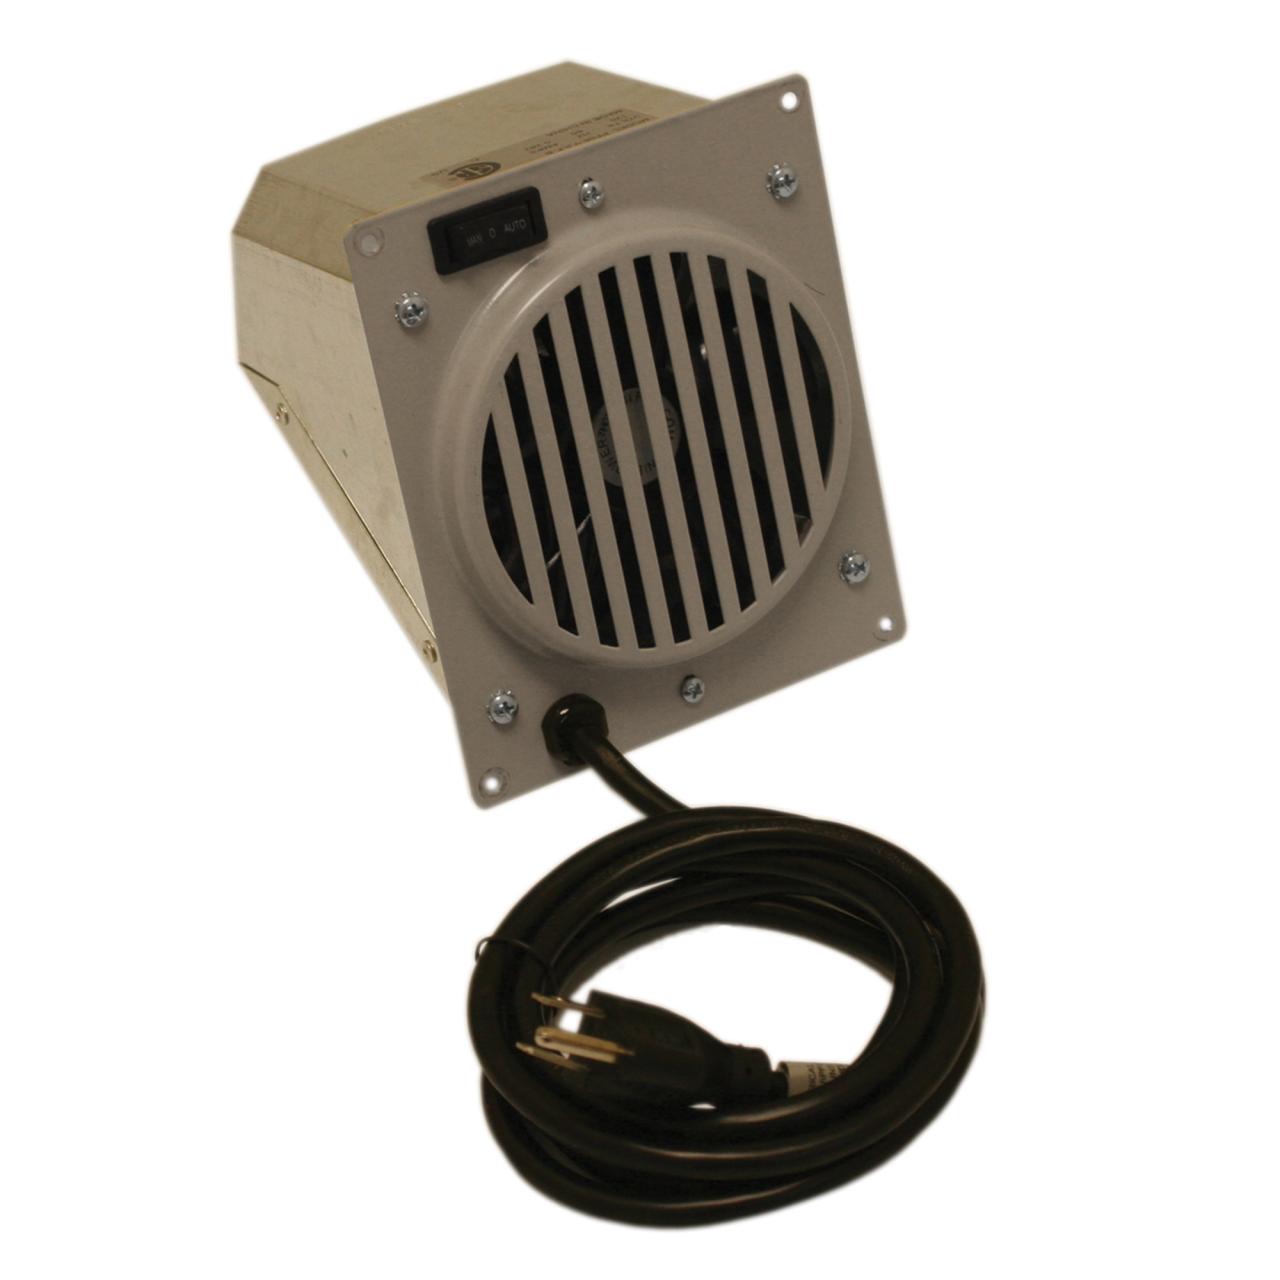 Cool Procom Recon Automatic Manual Thermostat Blower Model Pf06 Yjlf B R Interior Design Ideas Gentotryabchikinfo